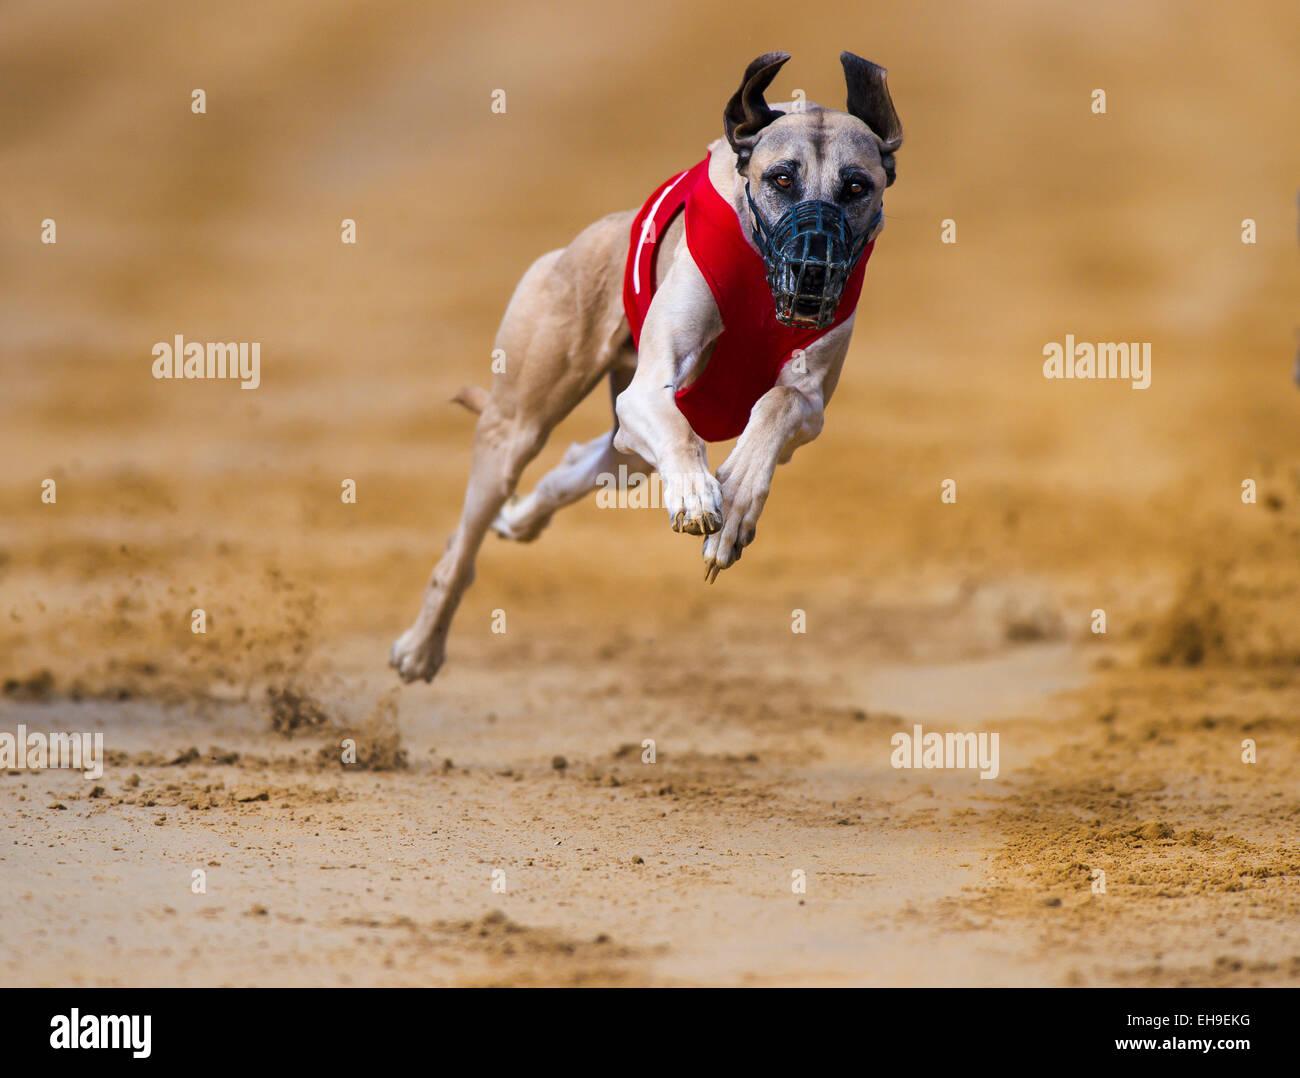 Sighthound on sand track, Stuttgart, Baden-Württemberg, Germany - Stock Image